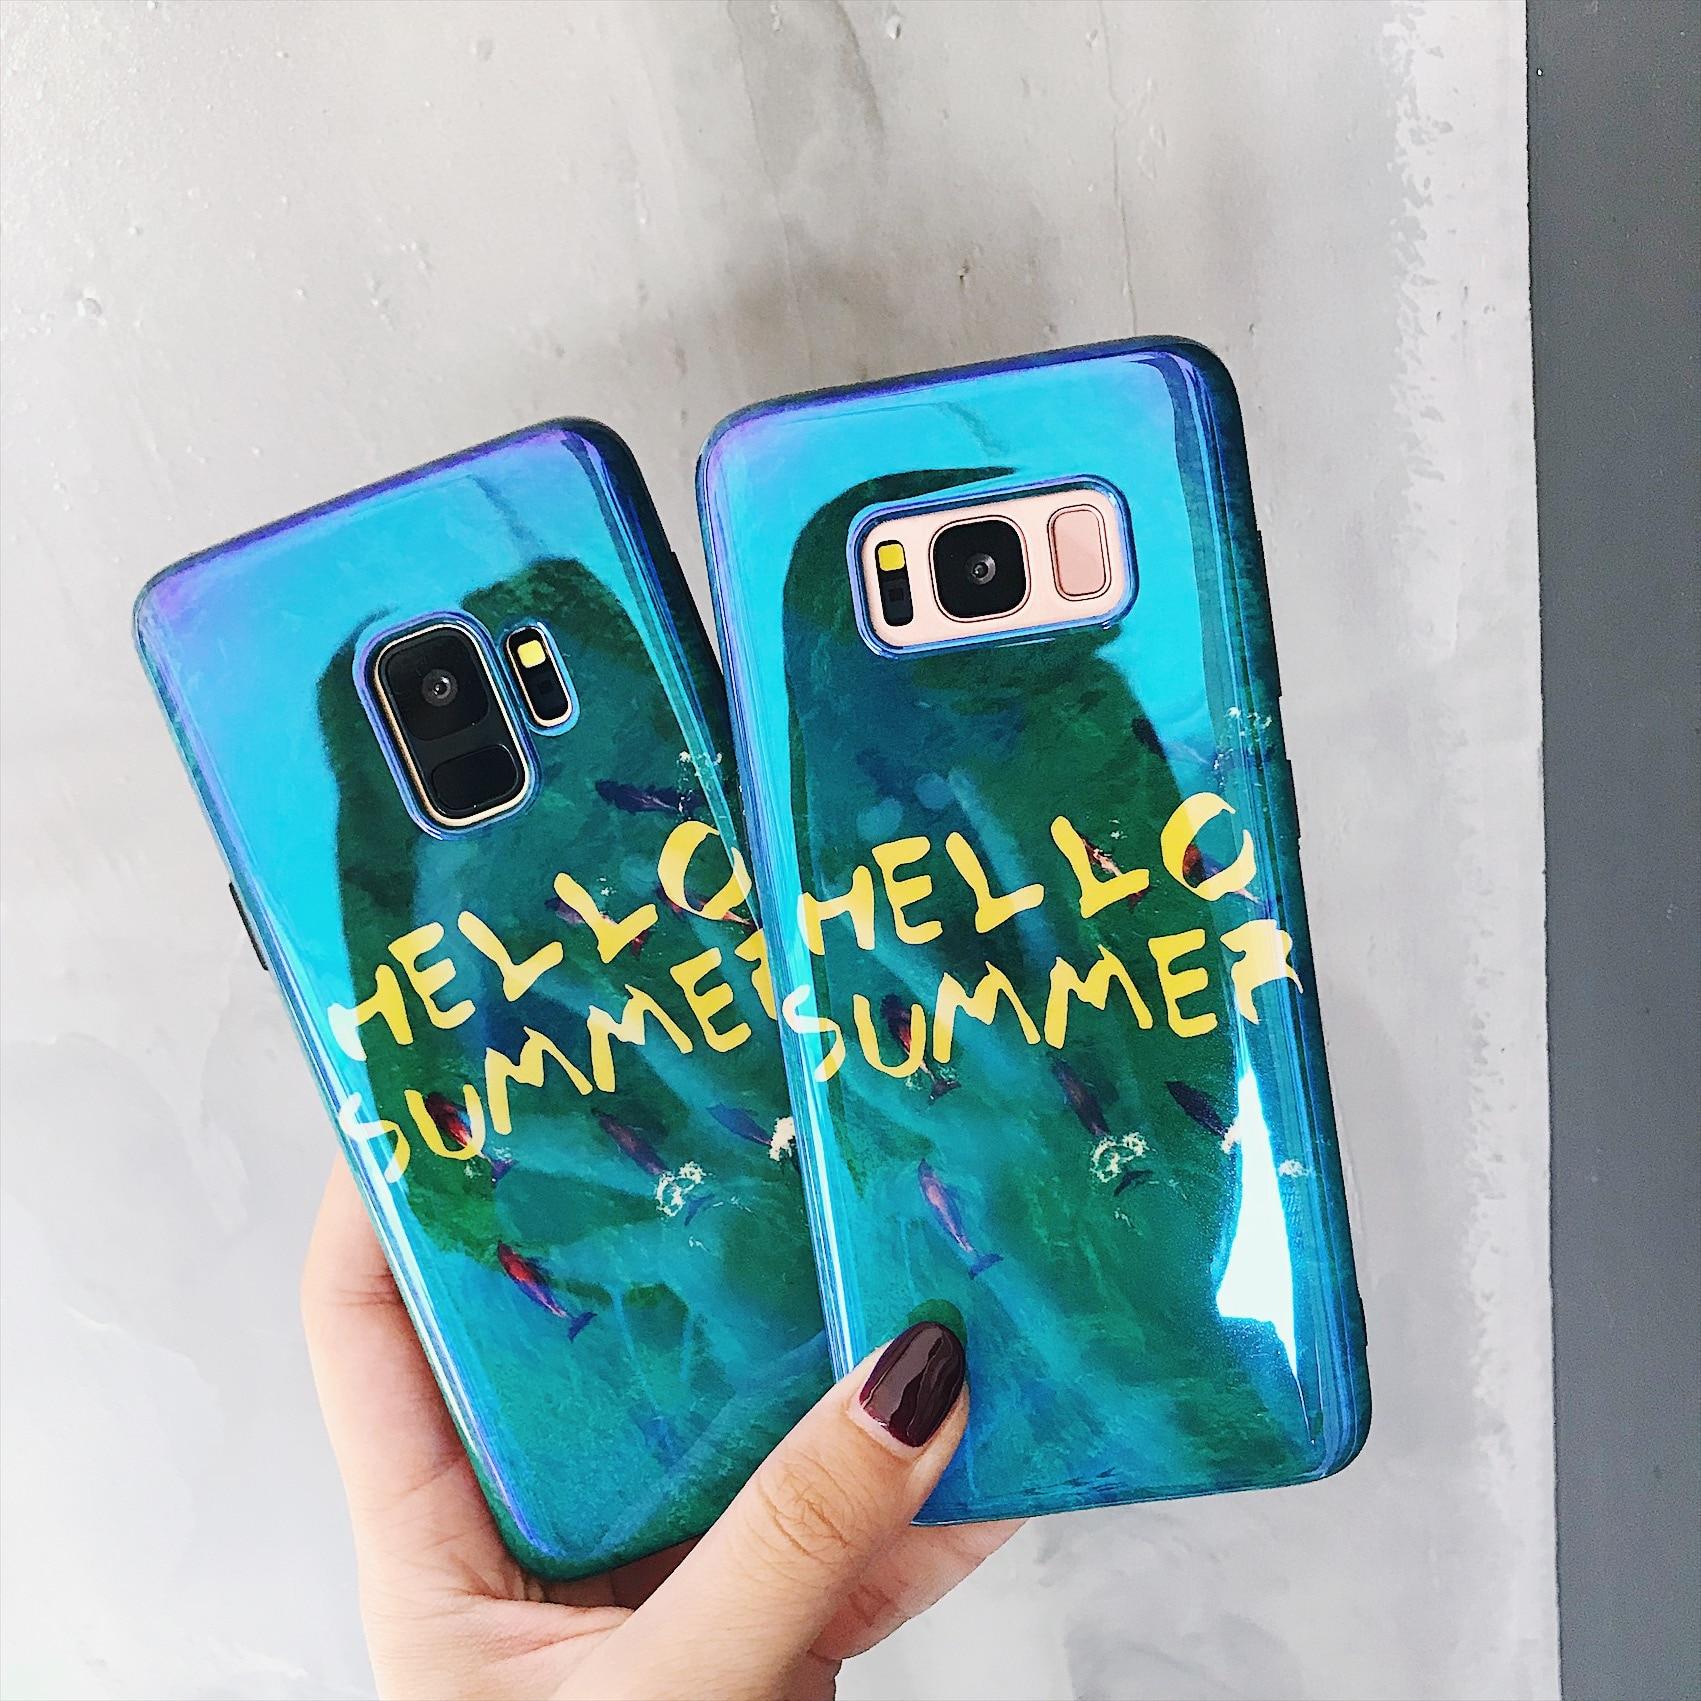 <font><b>Cases</b></font> For <font><b>Samsung</b></font> <font><b>Galaxy</b></font> <font><b>S8</b></font> Green Sea Blue-ray Soft Cover Hello Summer Letter <font><b>Phone</b></font> <font><b>Case</b></font> For <font><b>Galaxy</b></font> <font><b>S8</b></font> Plus IMD Shockproof Capa